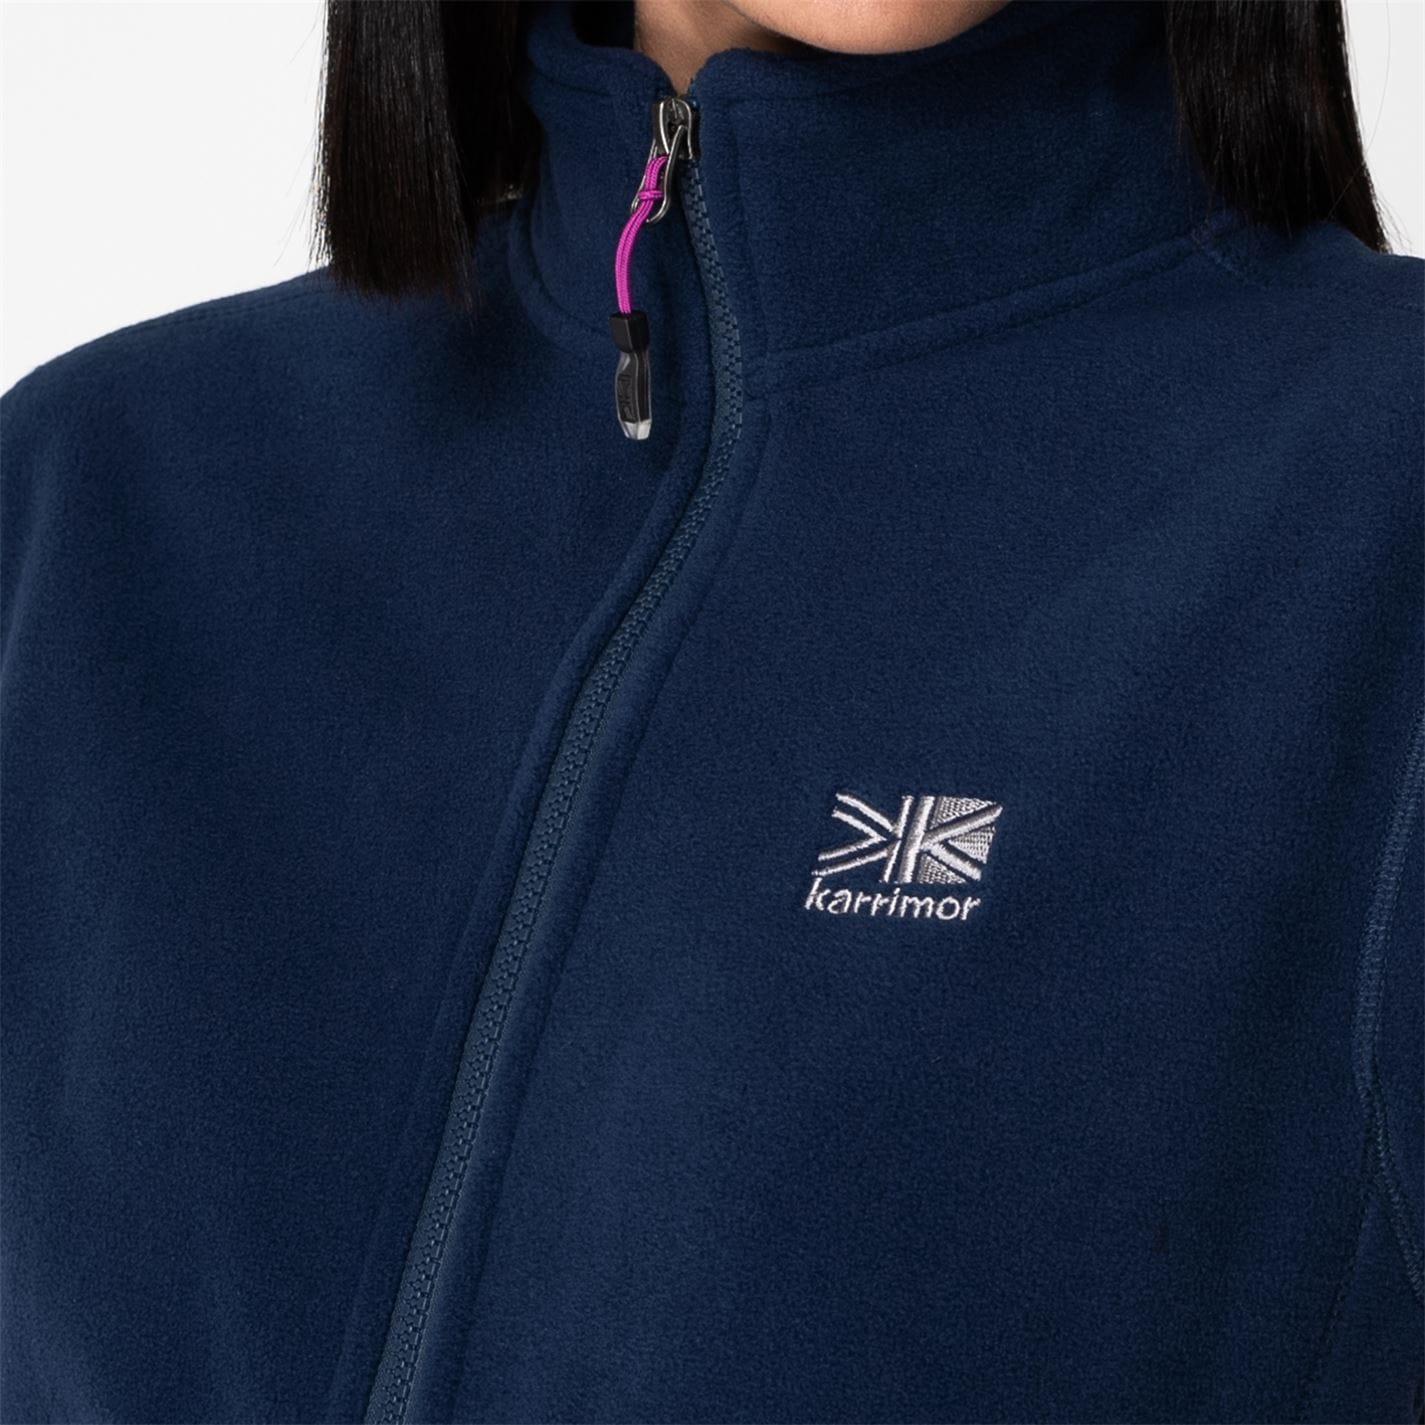 Bluze Jacheta Karrimor pentru Femei albastru bleumarin